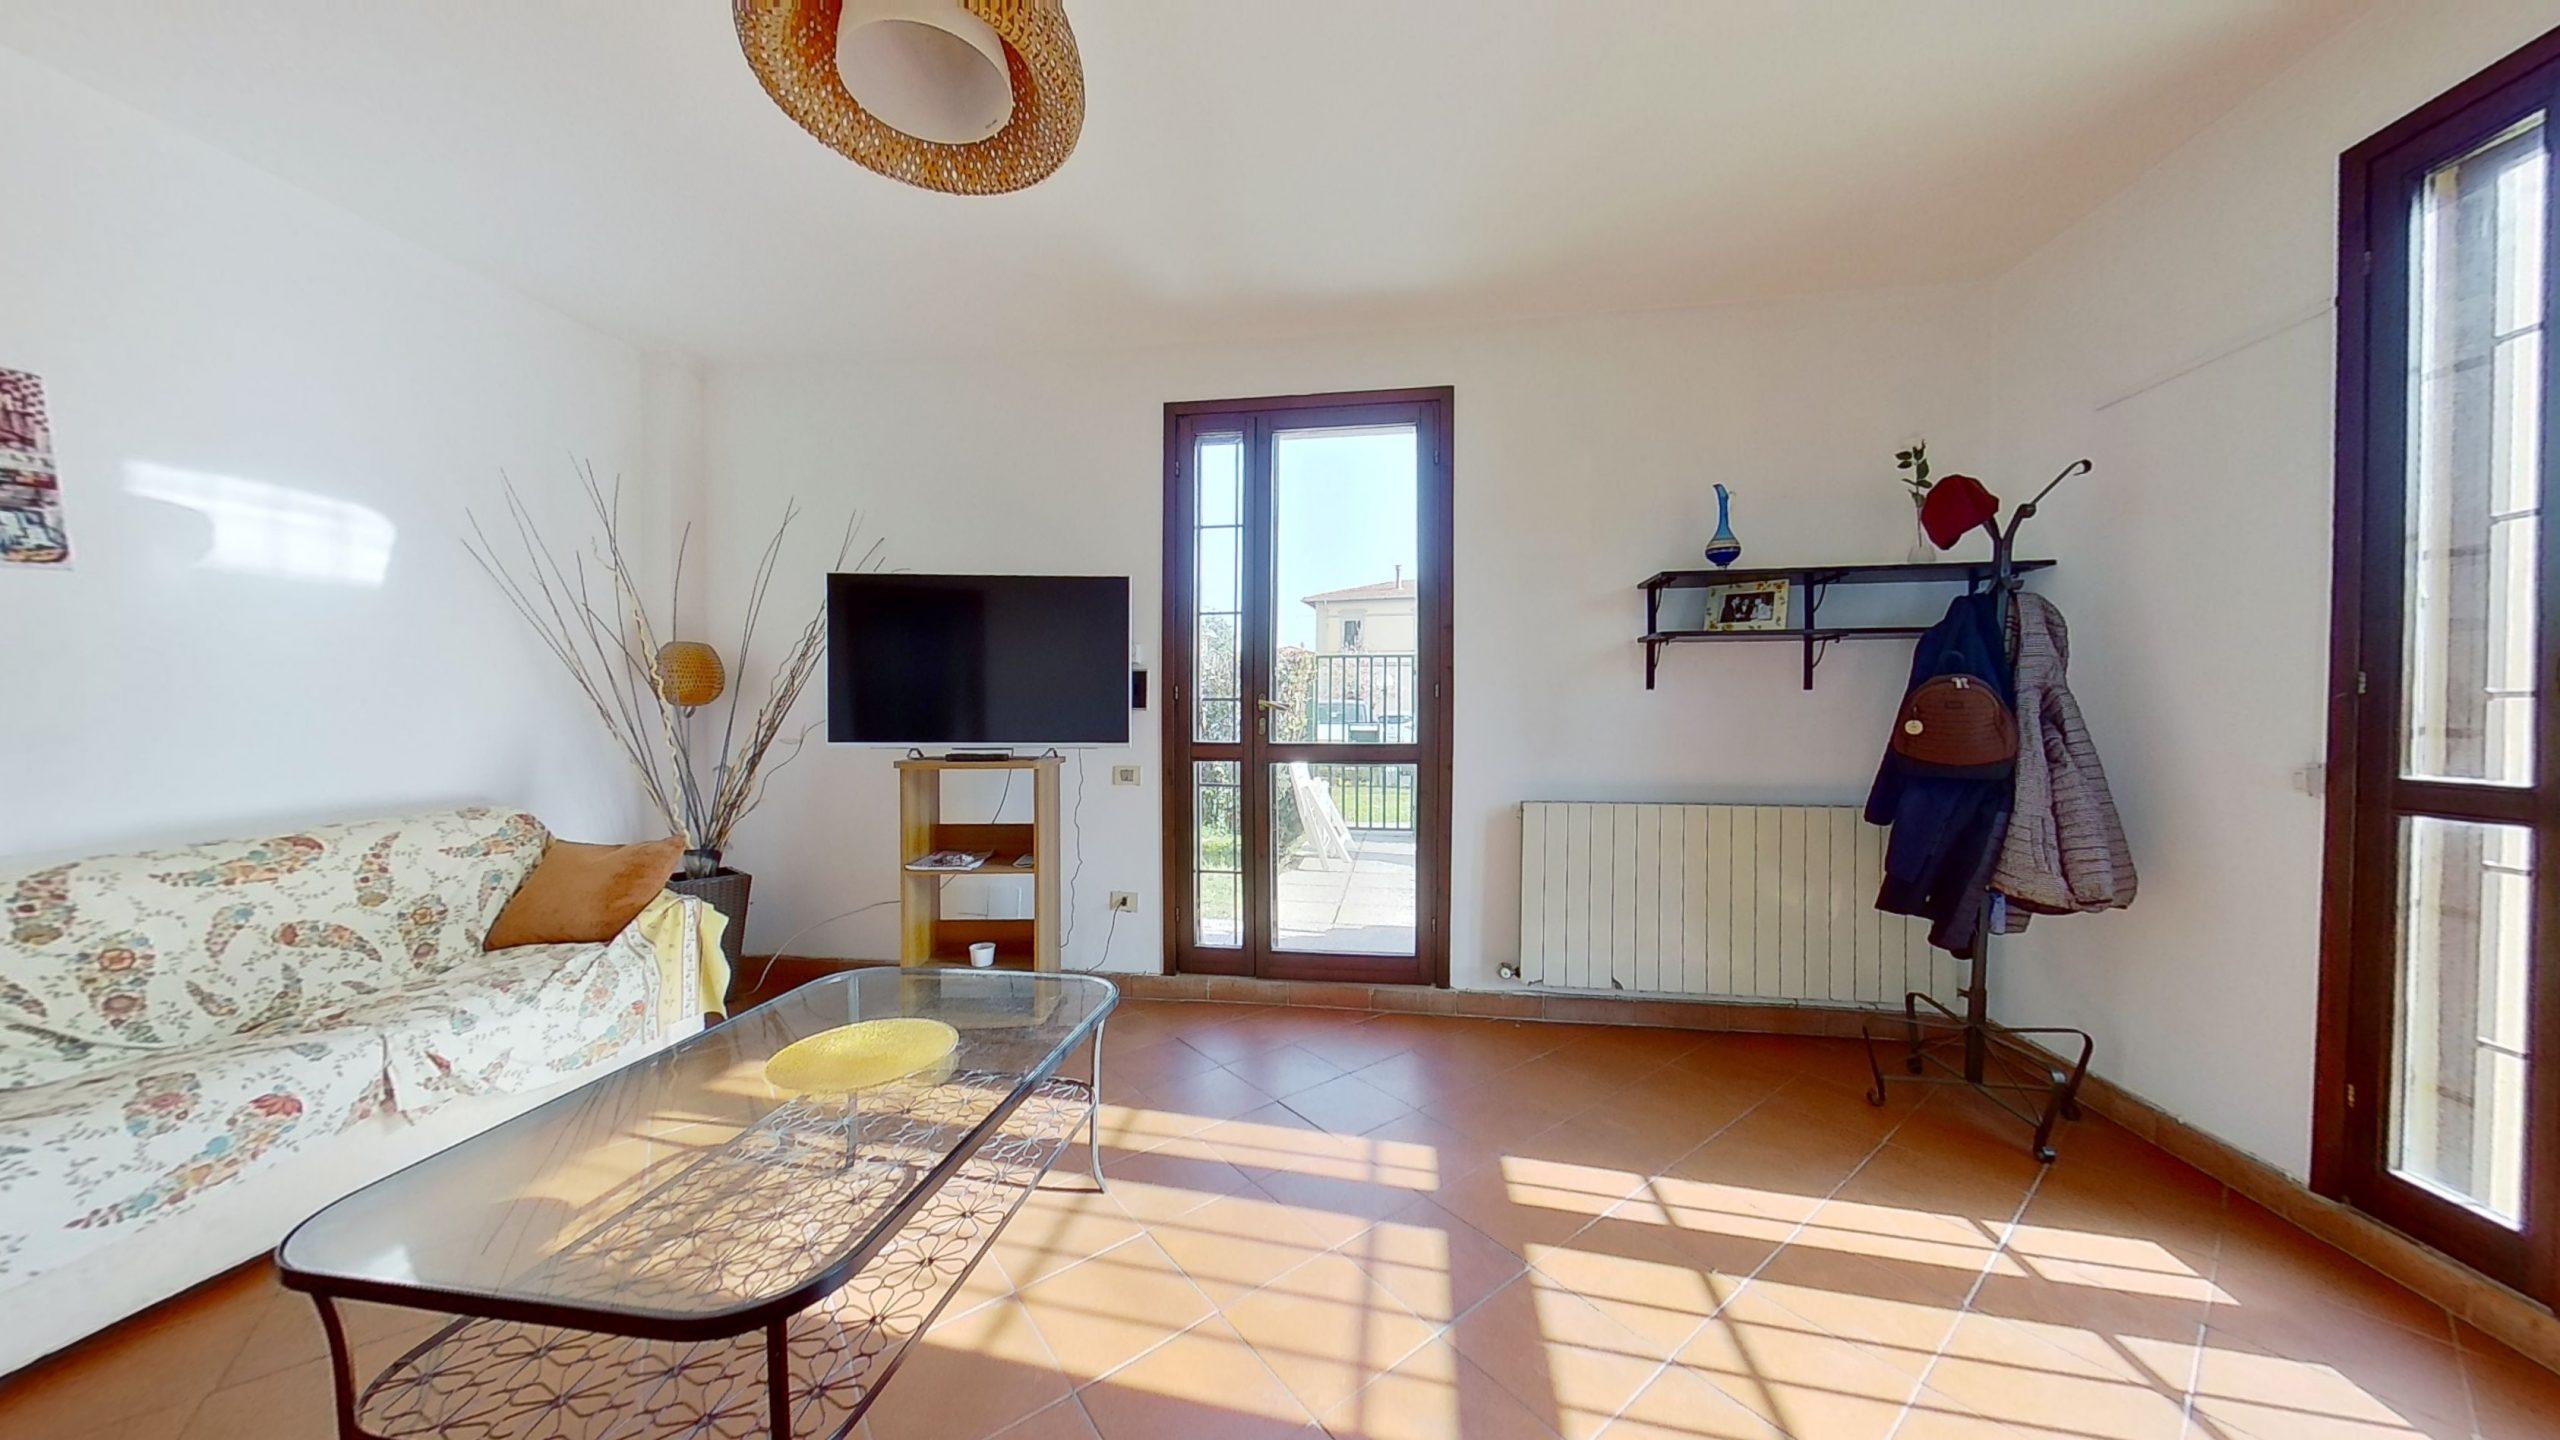 Appartamento indipendente con giardino in vendita a Barbaricina